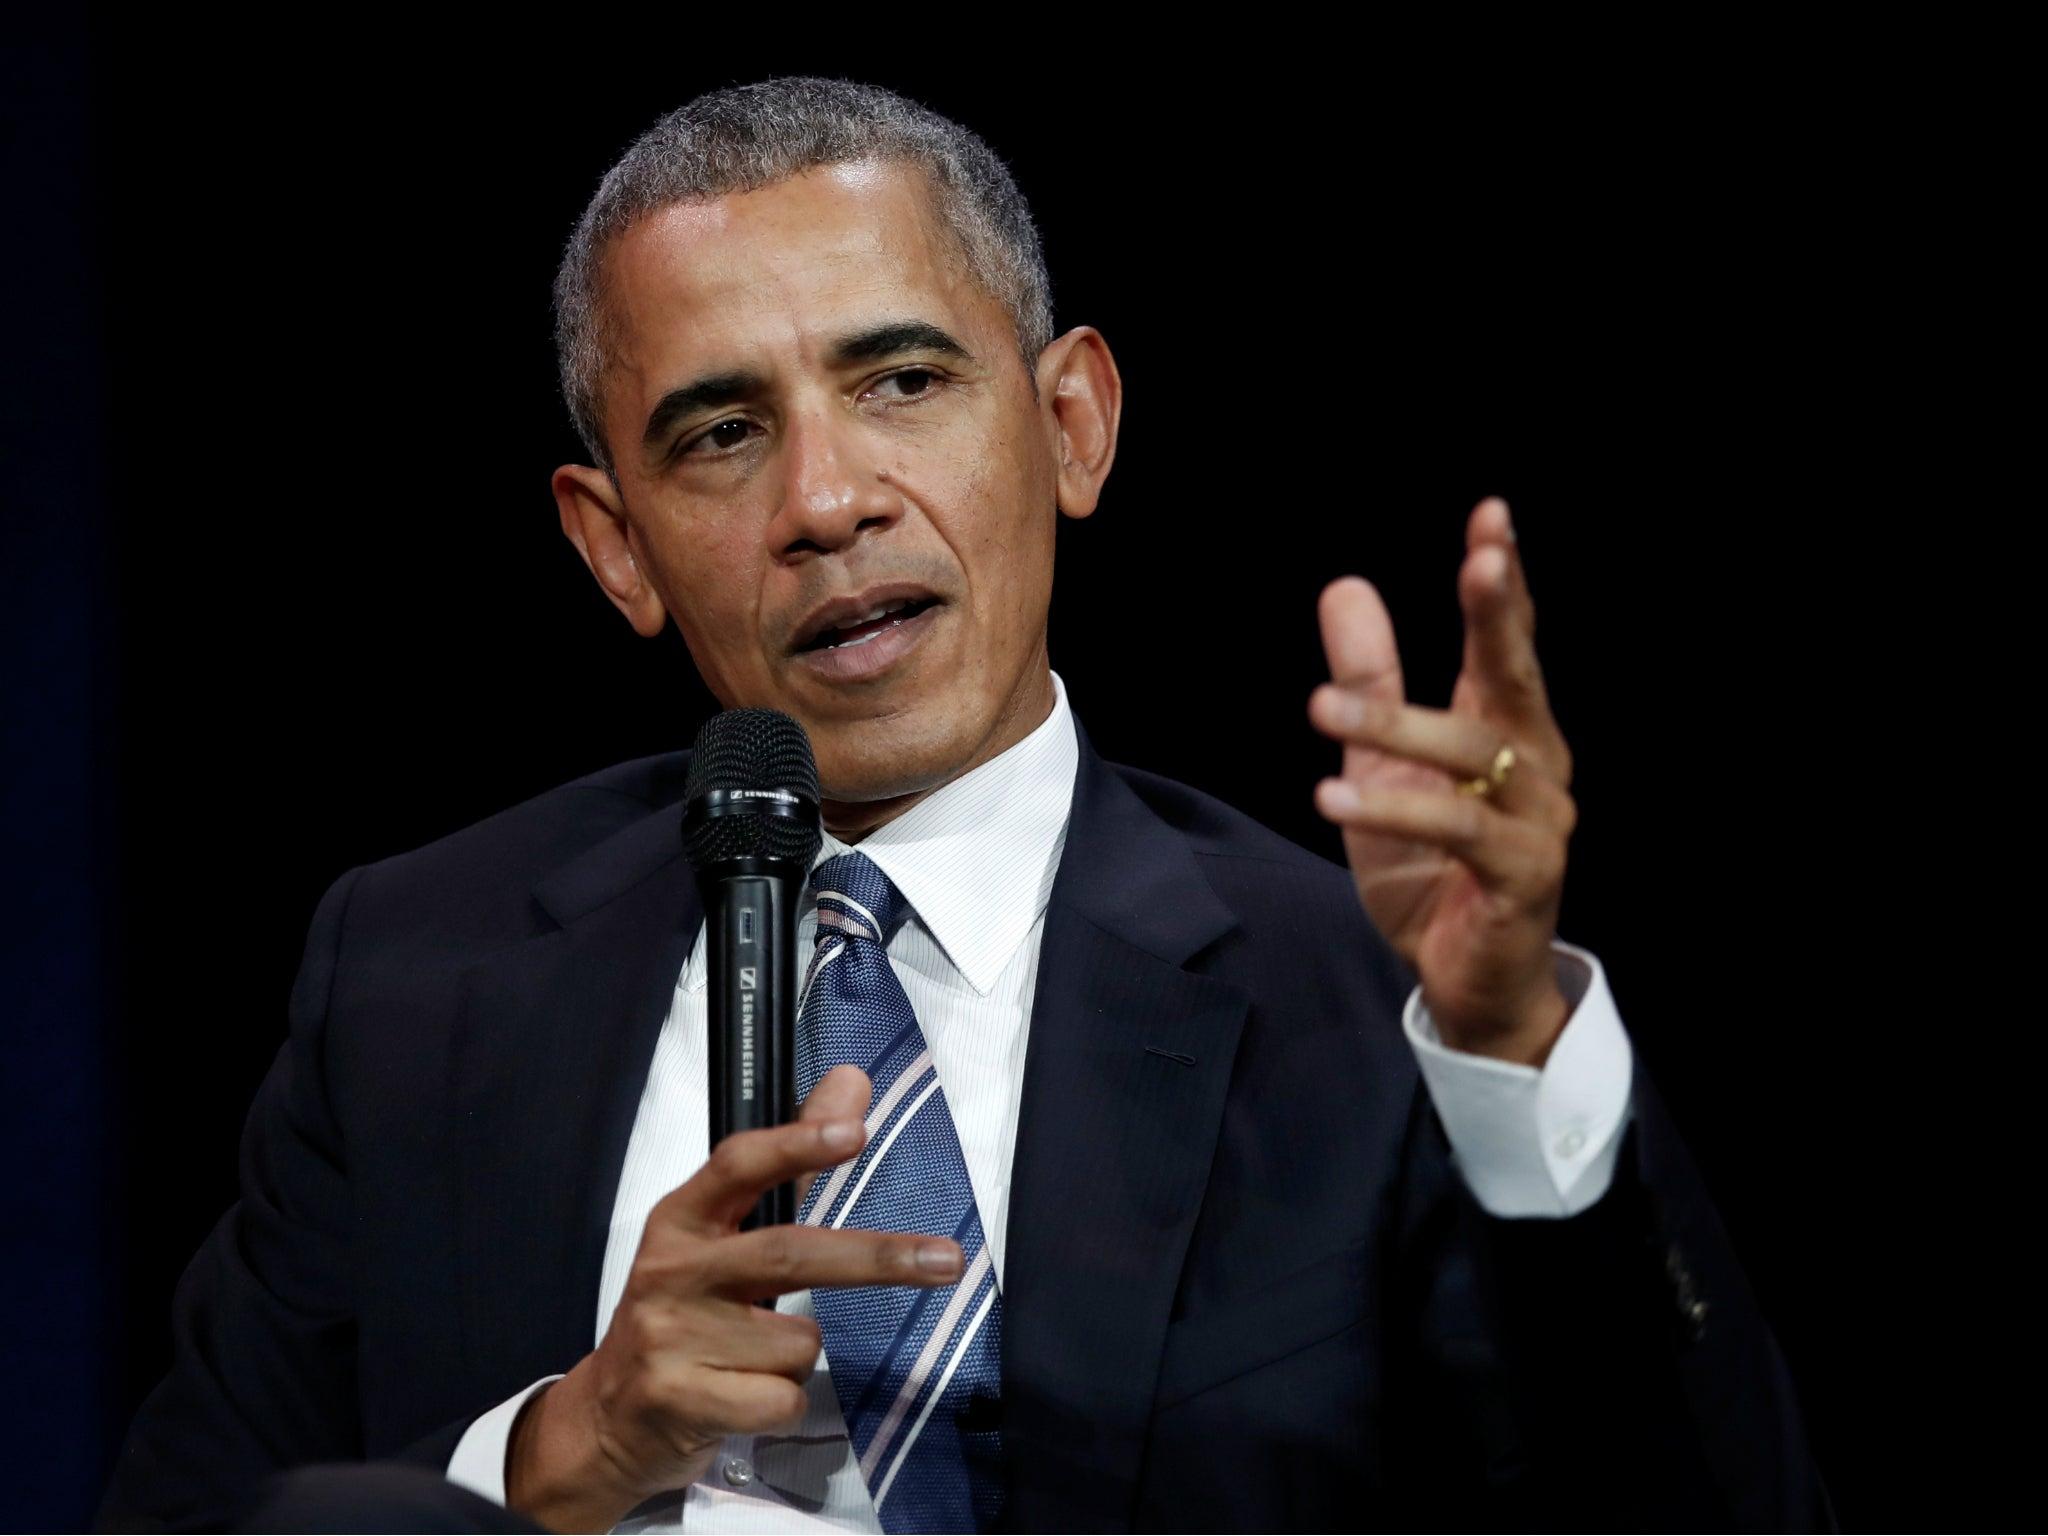 School Honouring Confederate General Renamed Barack Obama Elementary - The